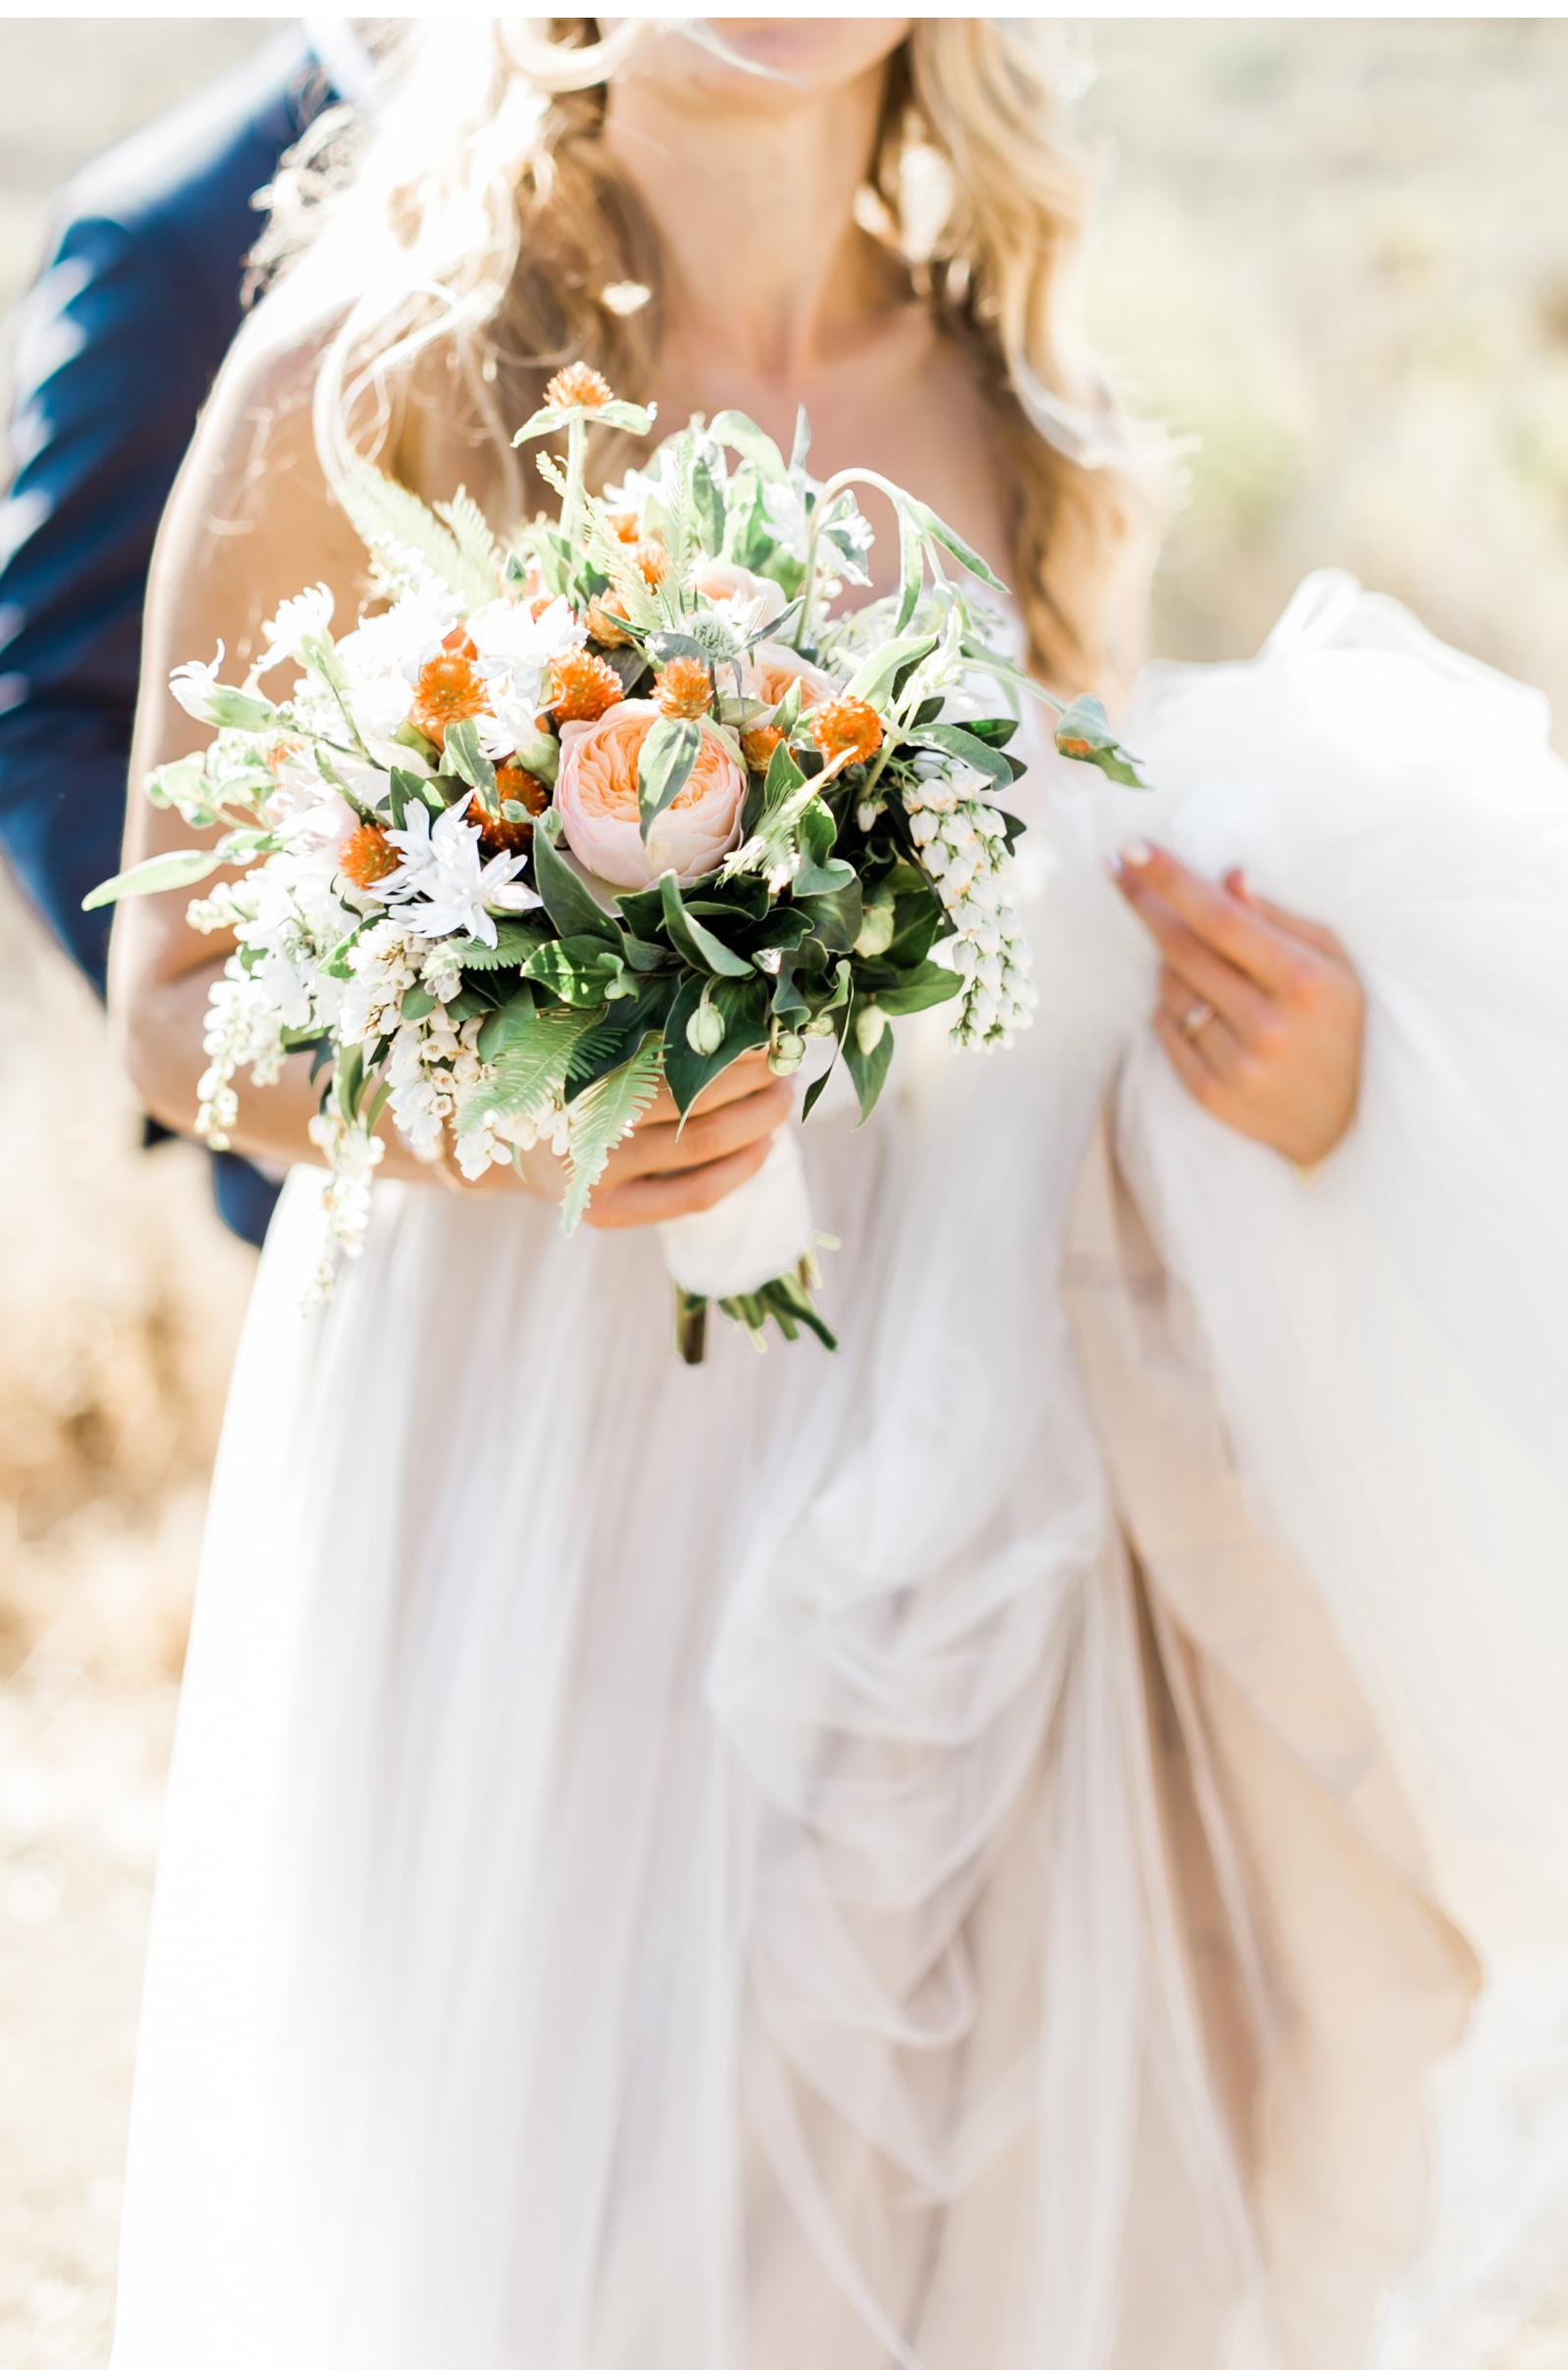 Style-Me-Pretty-San-Luis-Obispo-Wedding-Natalie-Schutt-Photography_06.jpg